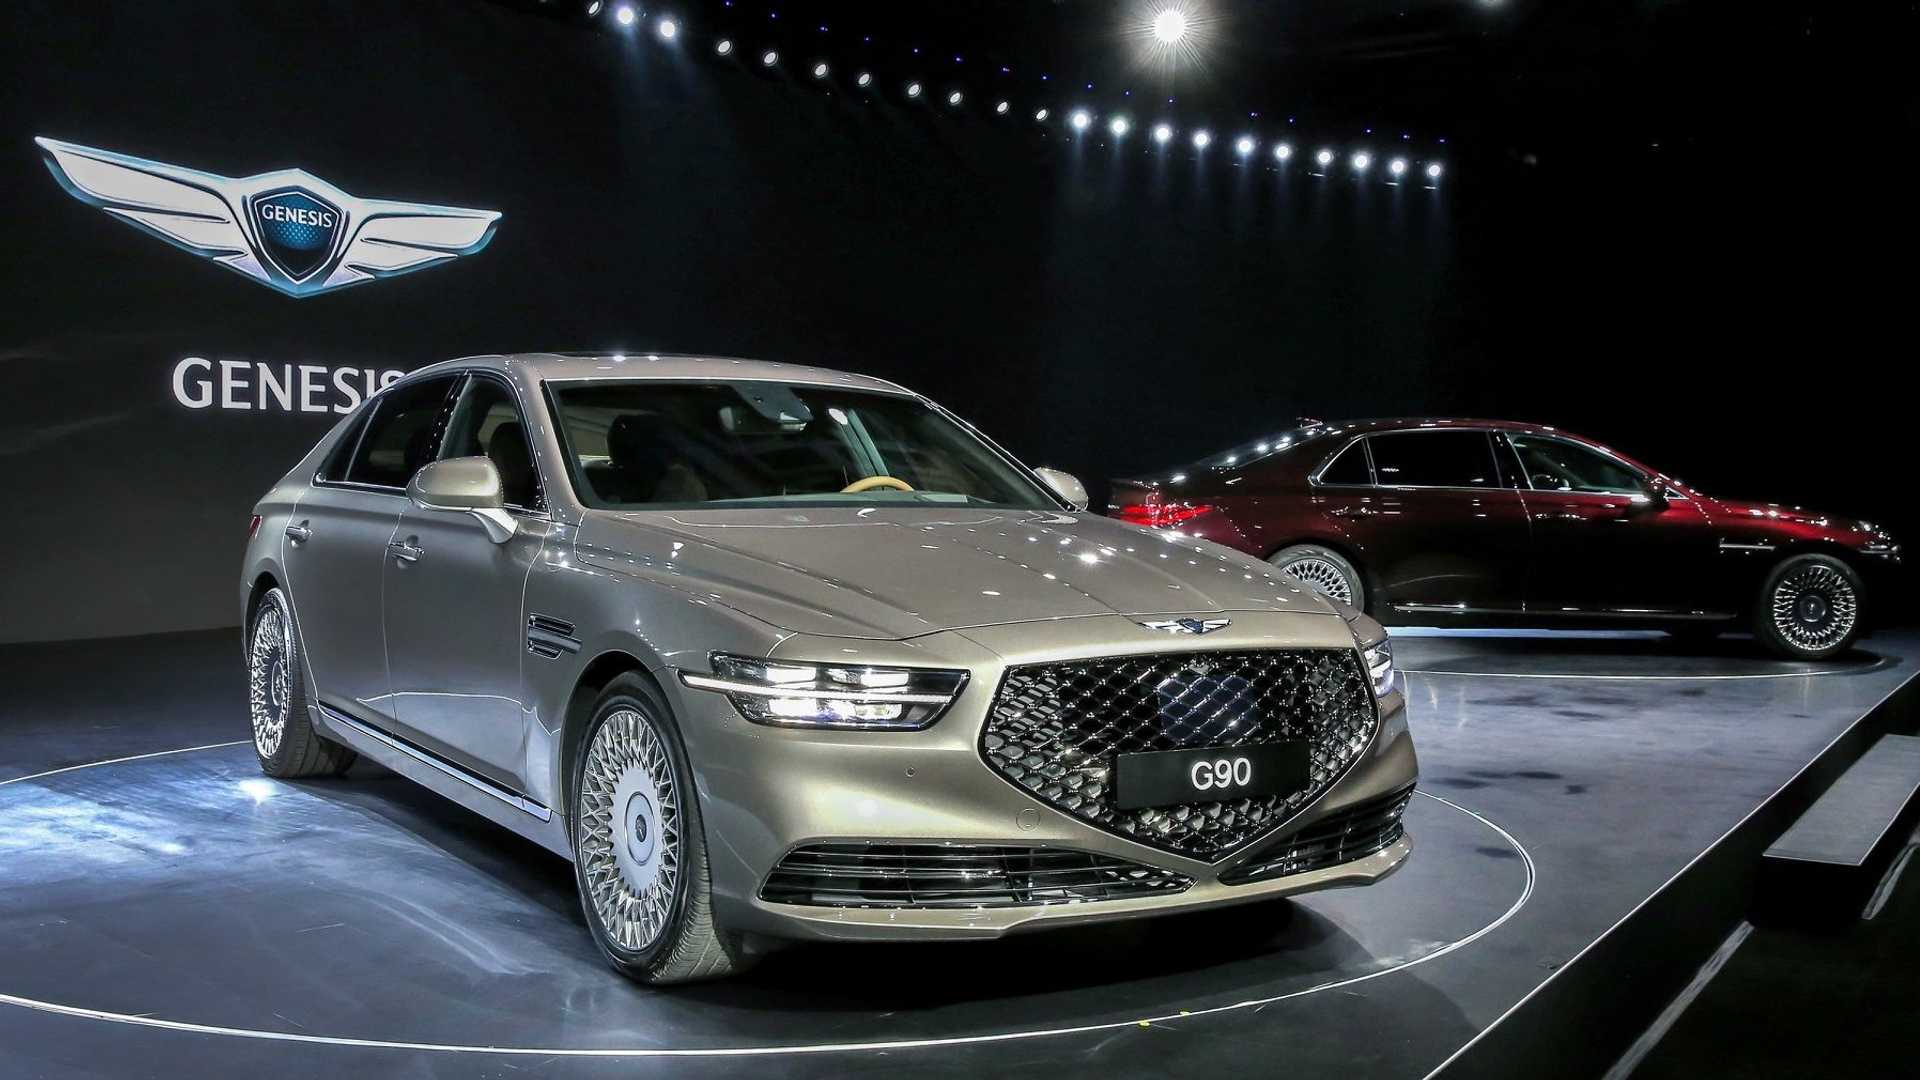 30 Gallery of Genesis Car 2020 Exterior and Interior by Genesis Car 2020